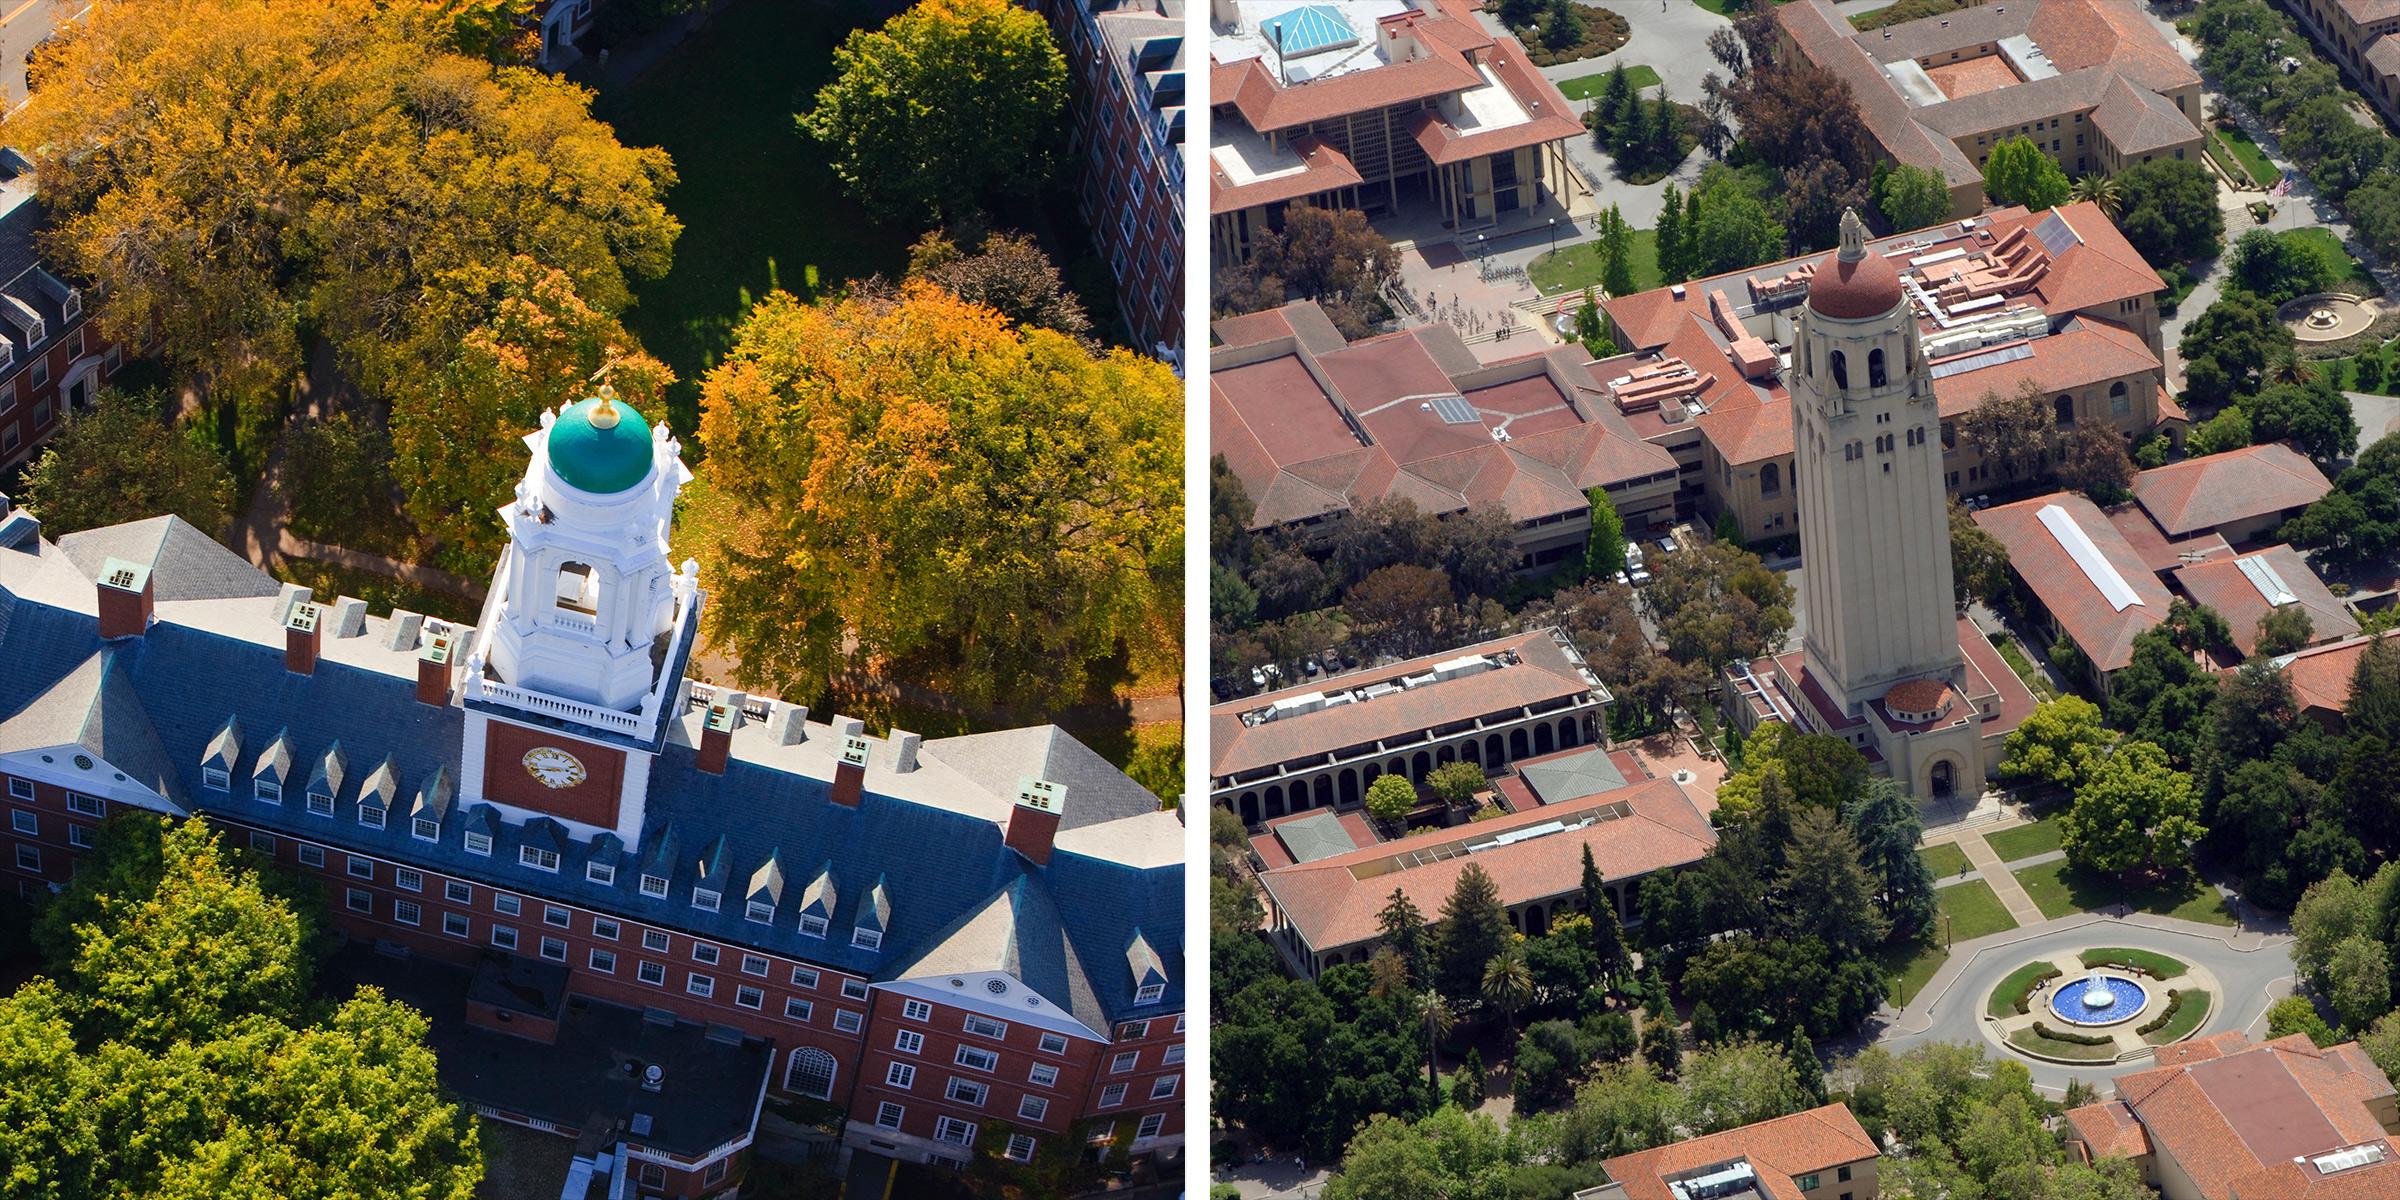 Aerial views of Harvard University and Stanford University.